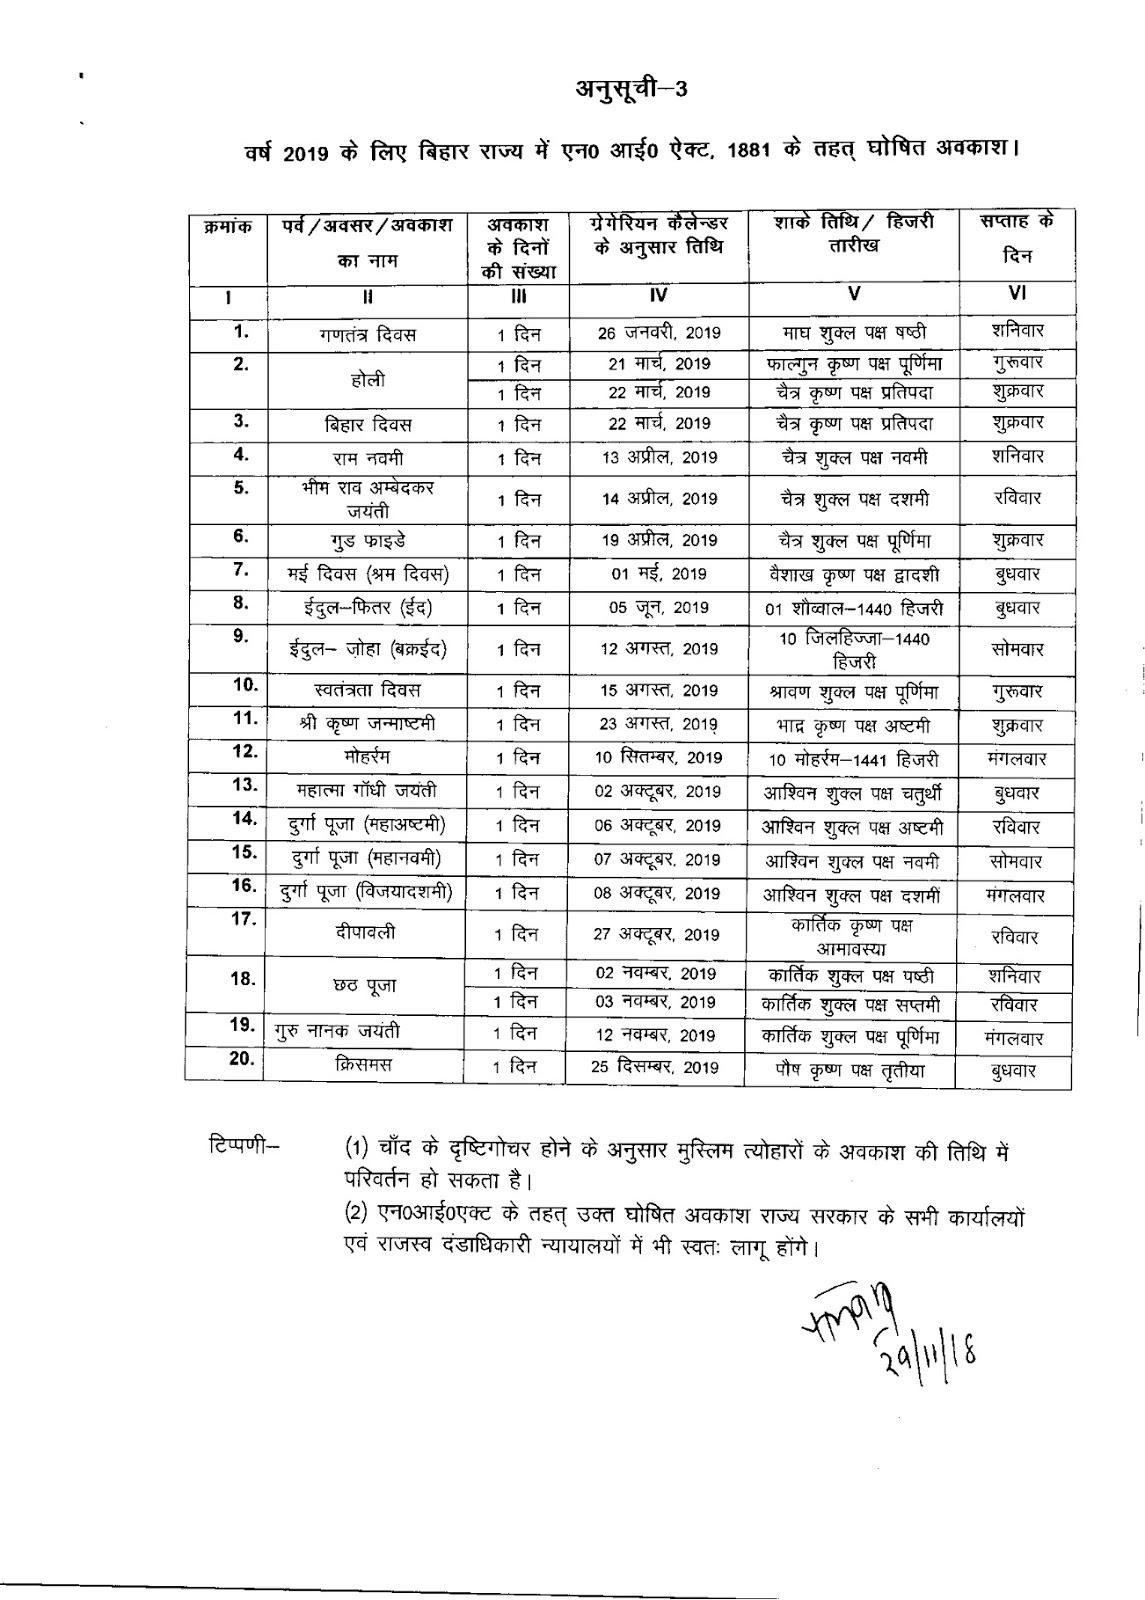 Bihar Sarkar Clender | Calendar For Planning throughout Bihar Sarkar Holiday Calendar